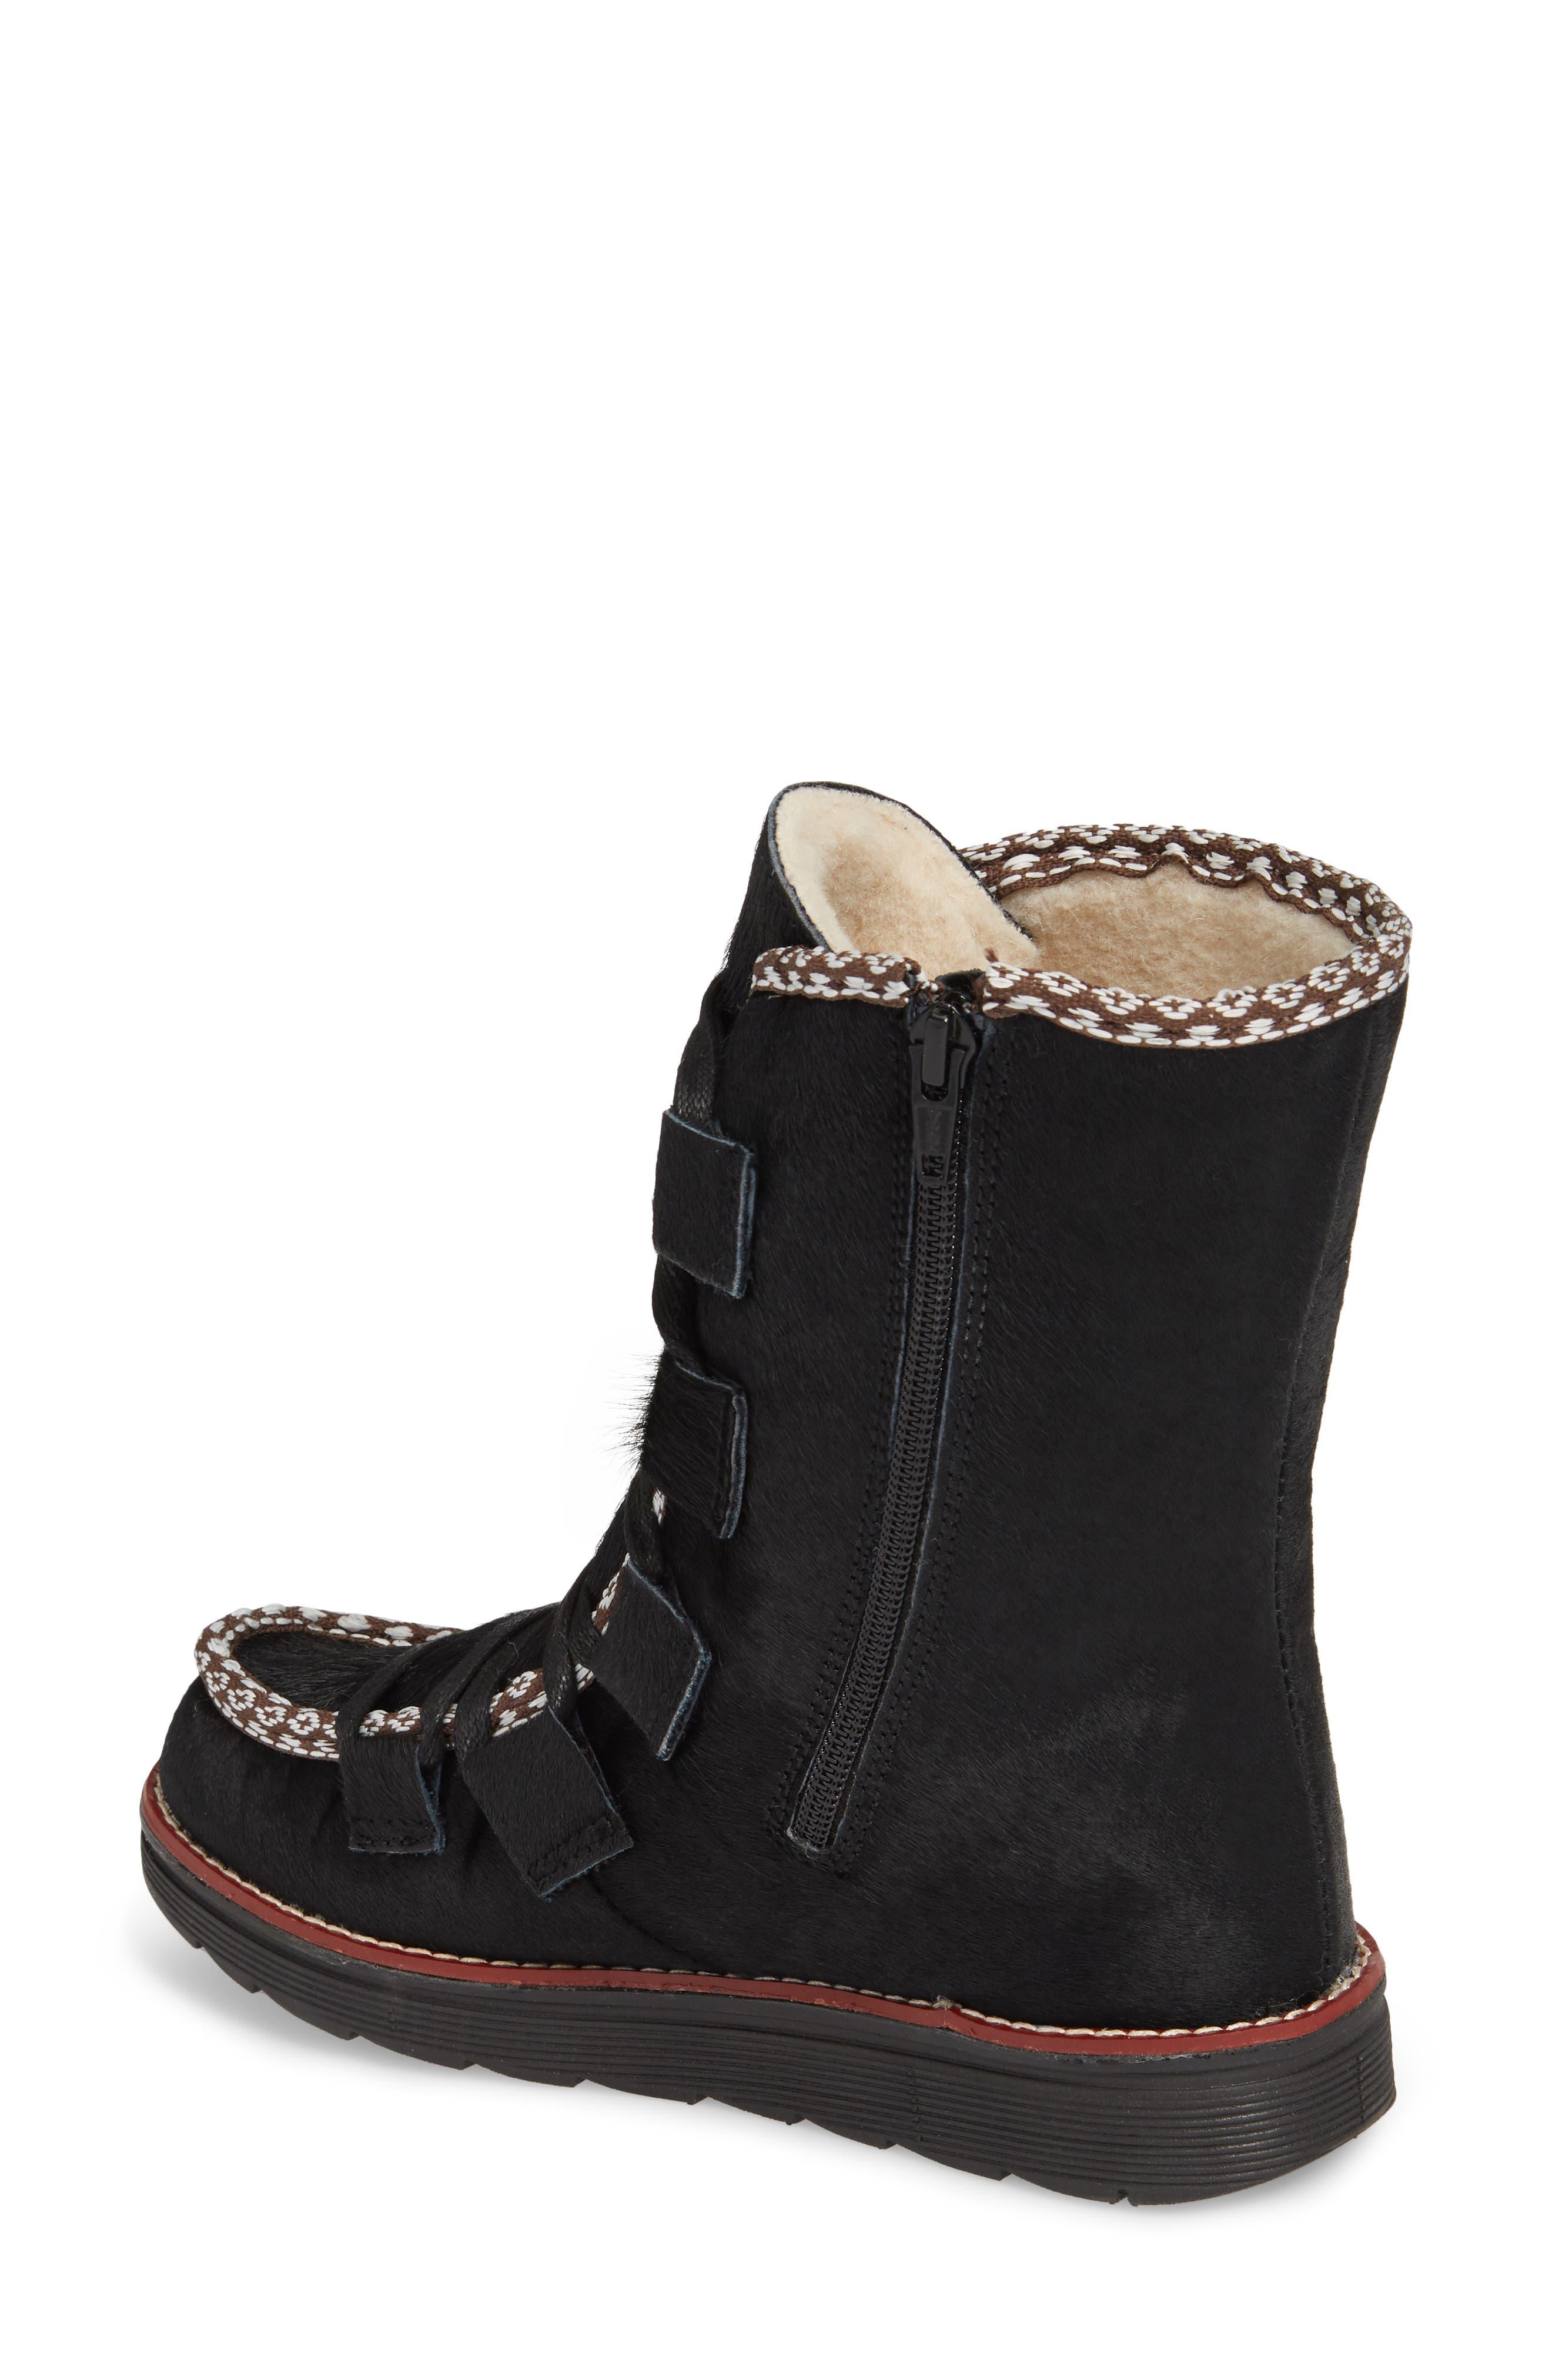 Kitchener Waterproof Genuine Calf Hair Snow Boot,                             Alternate thumbnail 2, color,                             Black